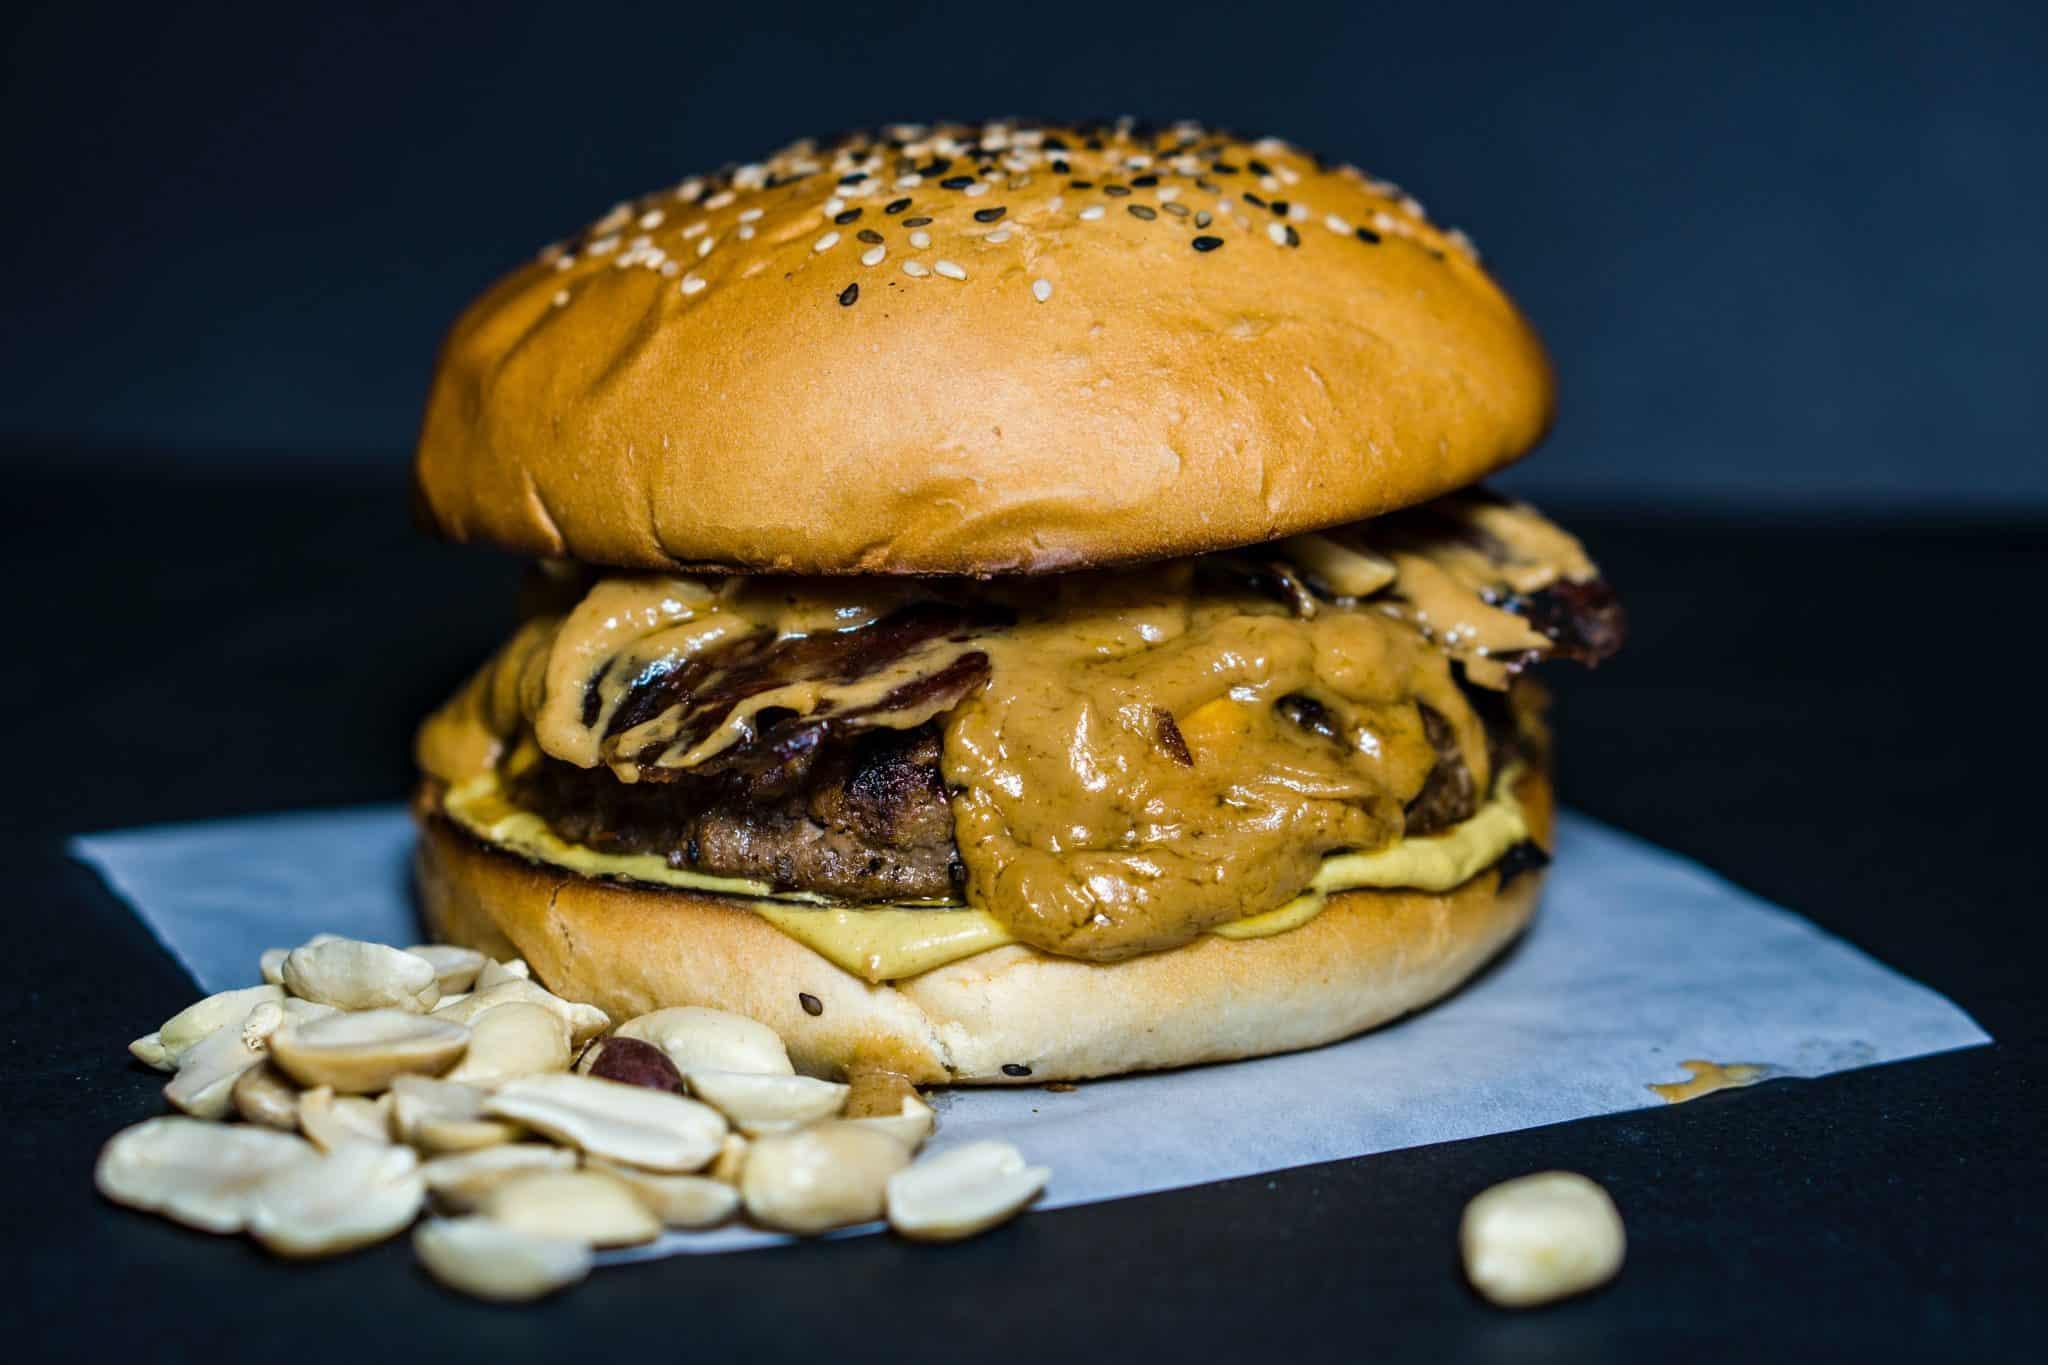 Peanut butter burger unusual food pairings |